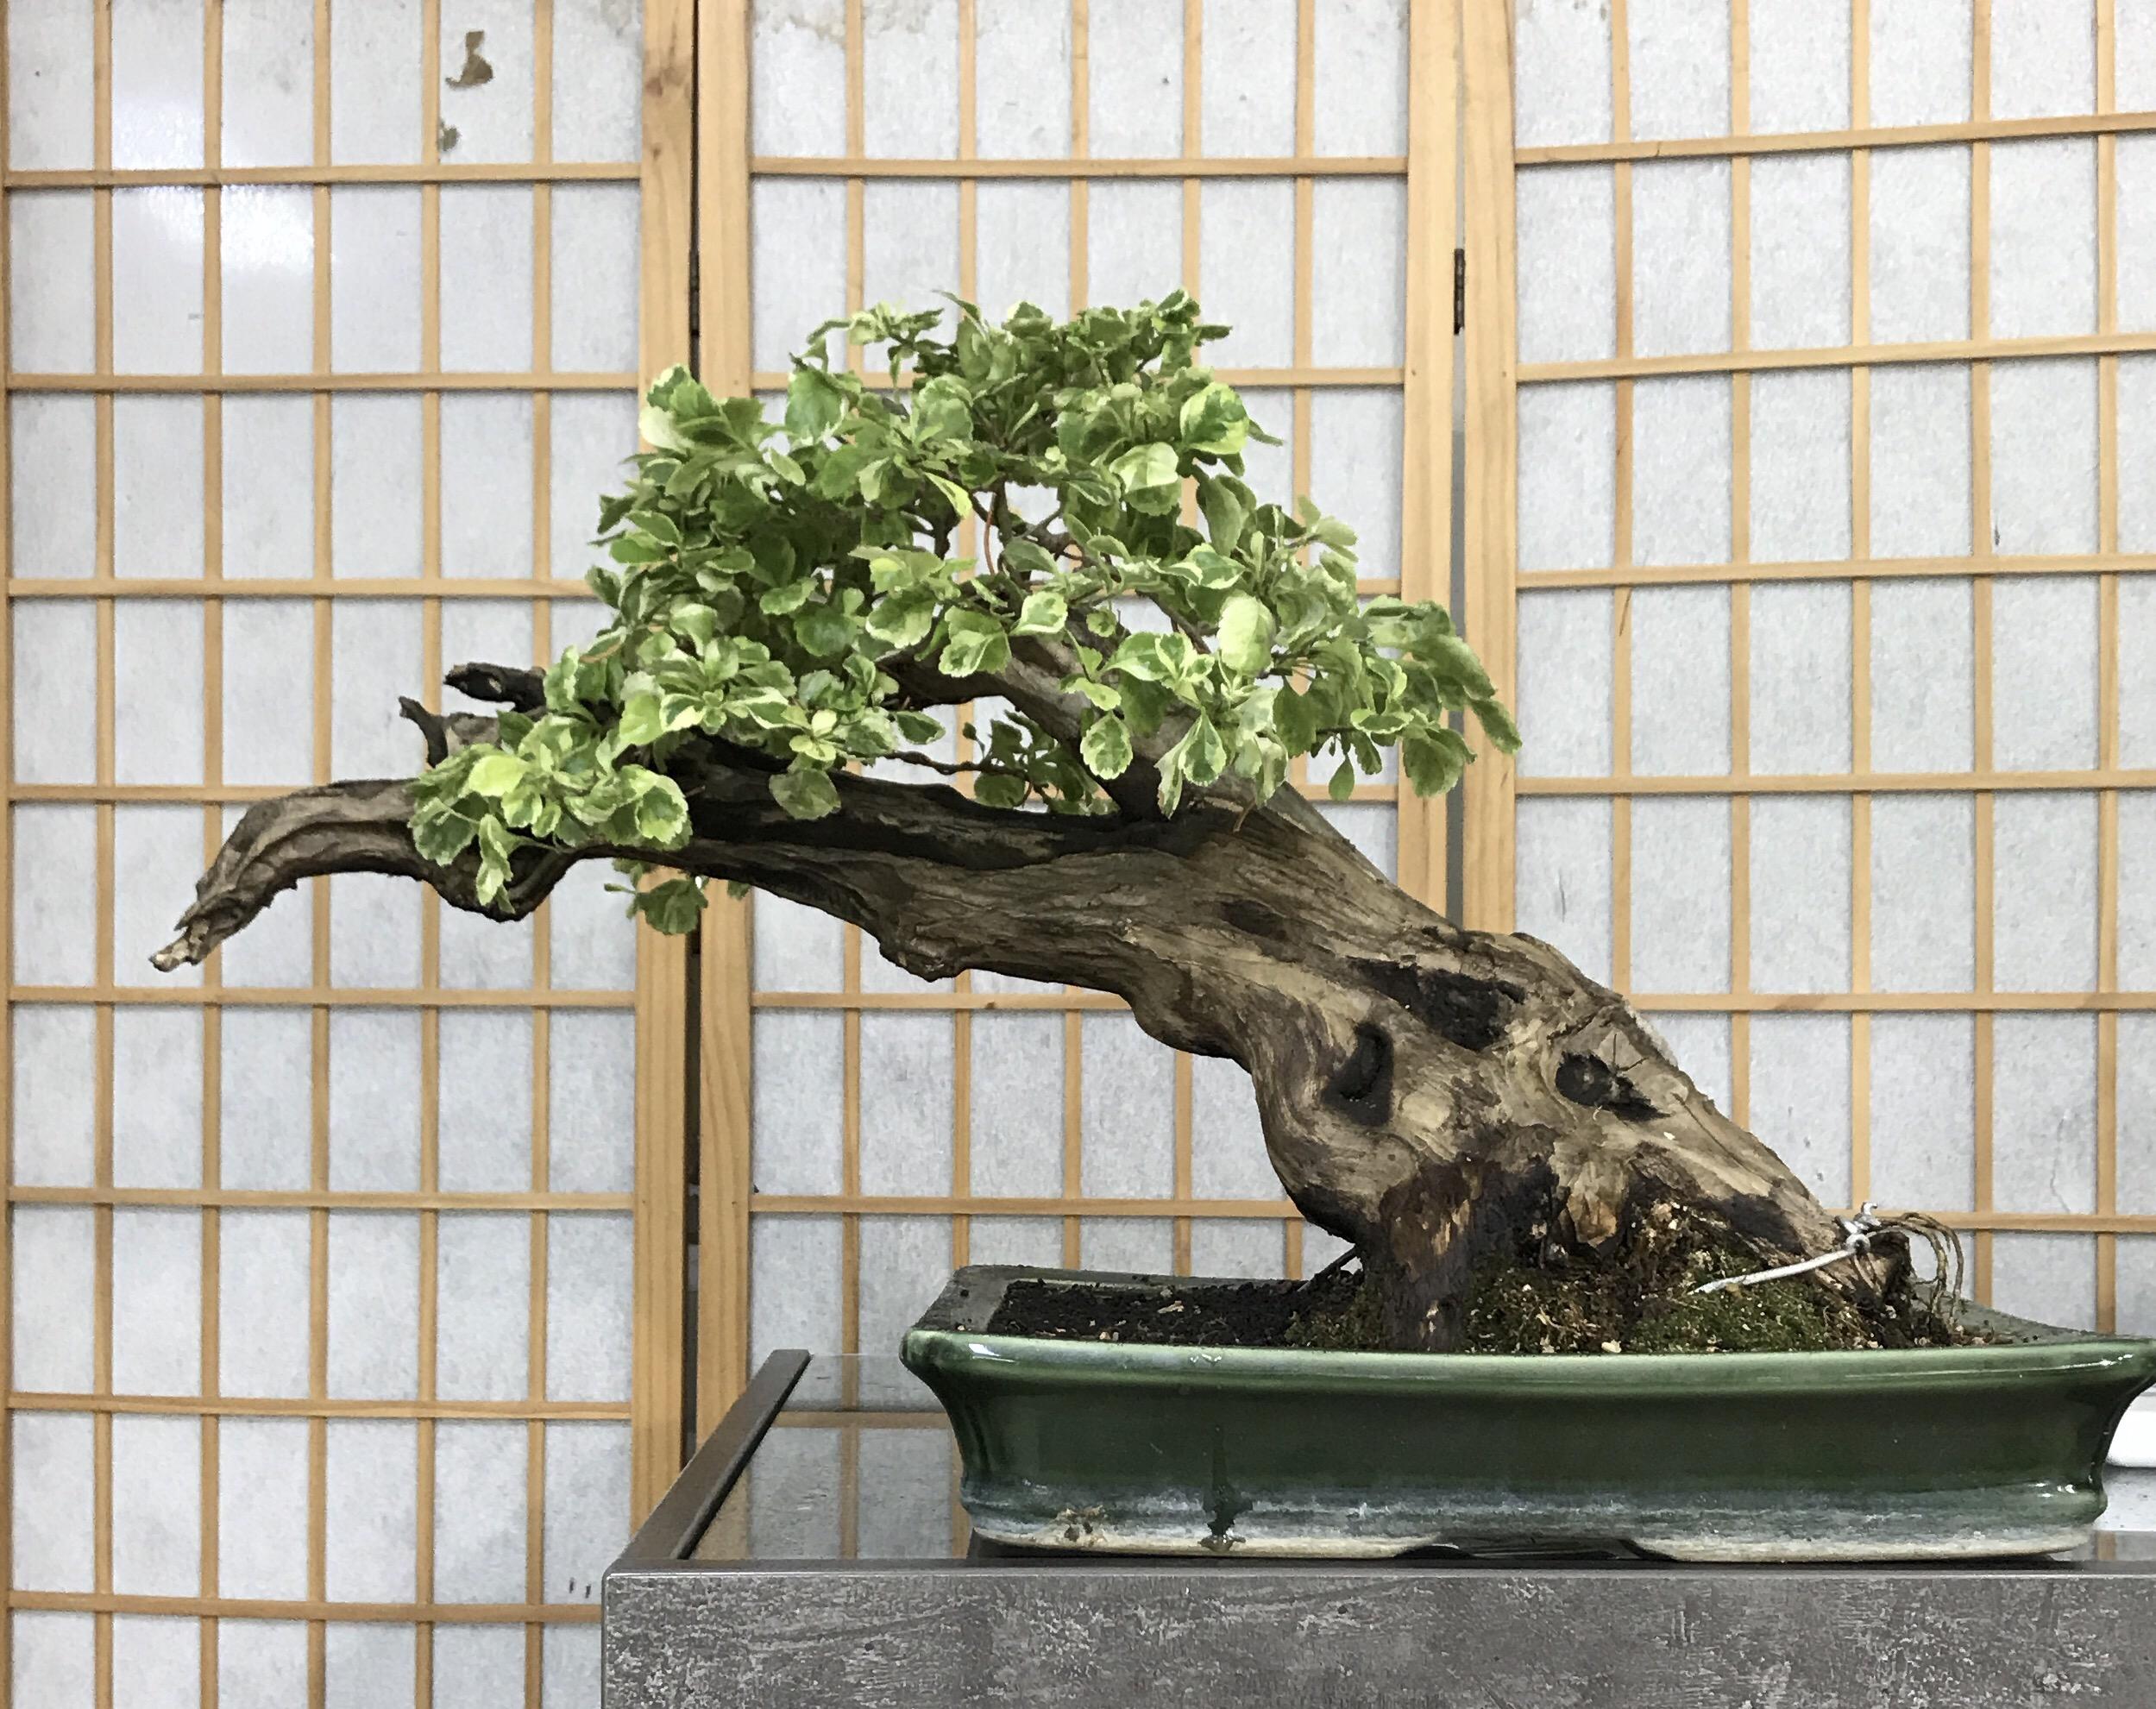 Bonsai Wabikusa Japan Gartengestaltung in Berlin Bonsai Eibe Japan in BerlinBonsai solitär Durantha